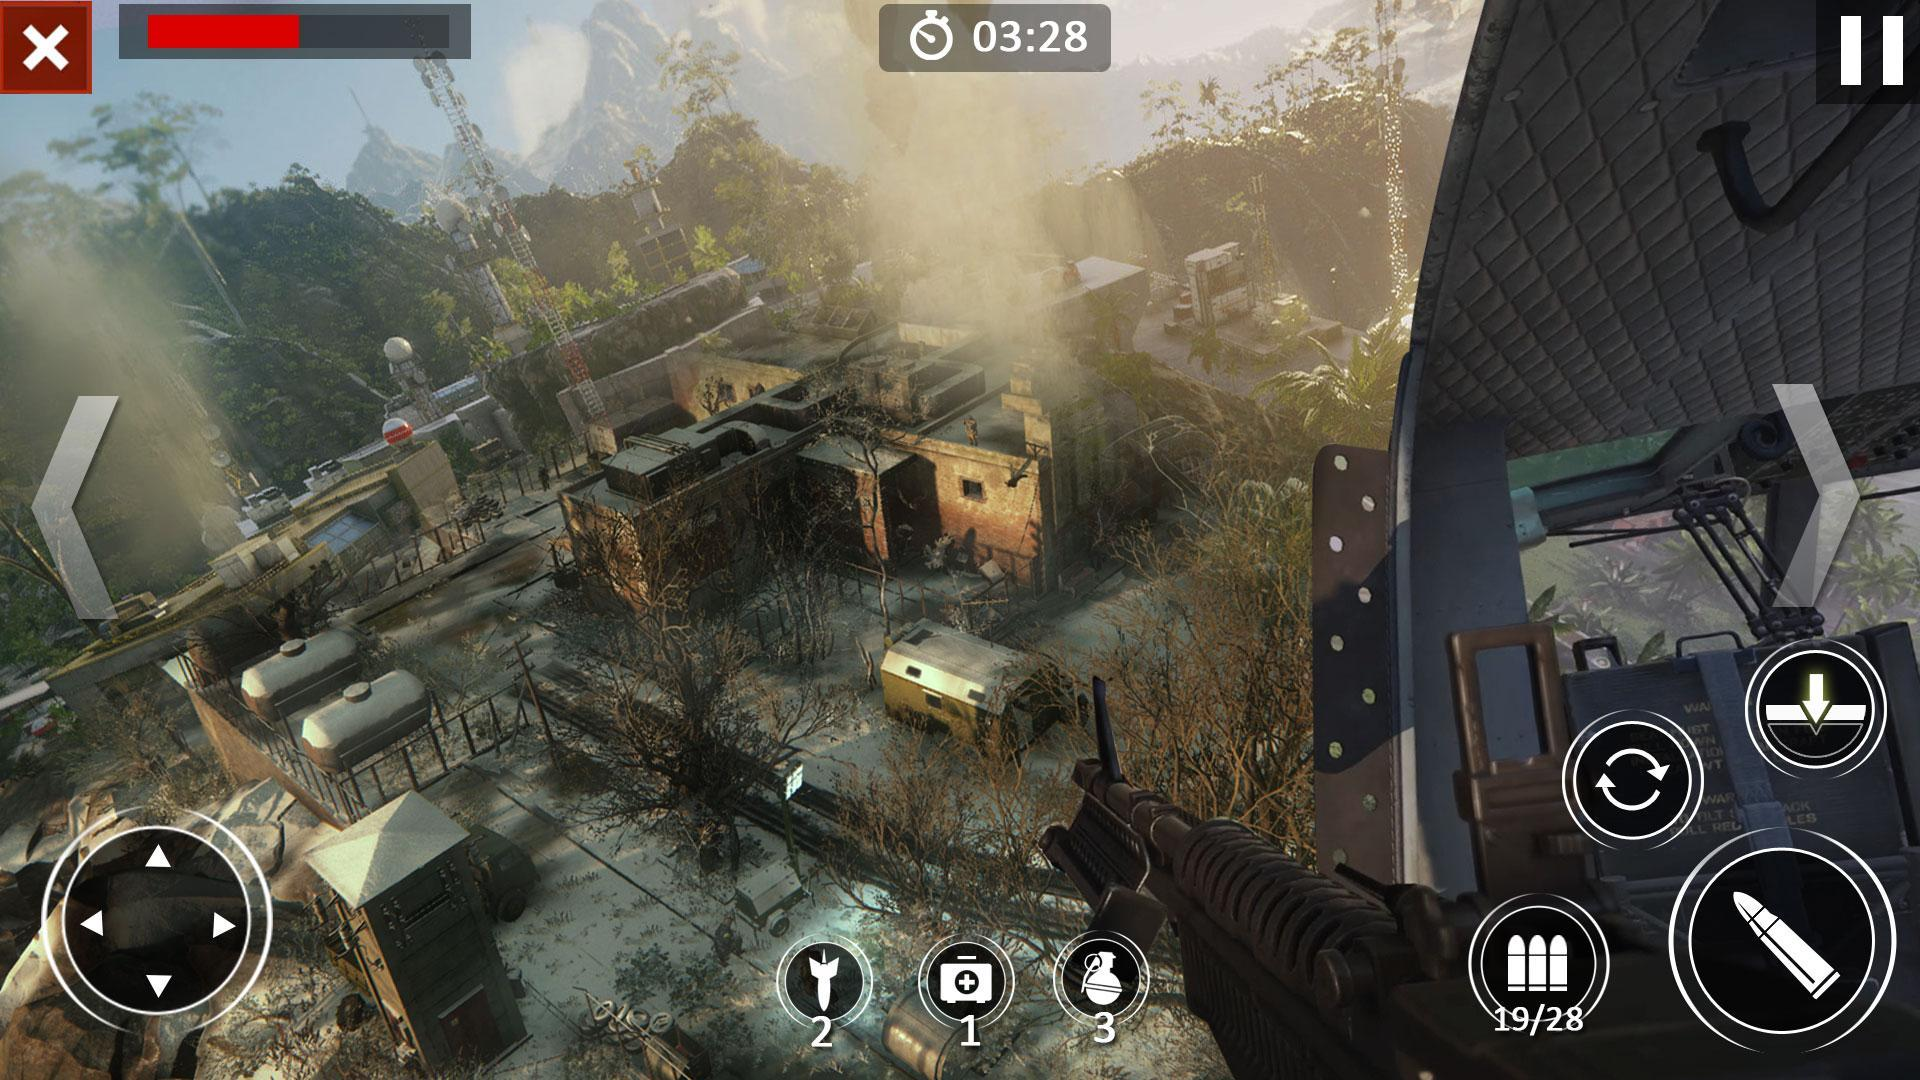 Battlefield เกมในตำนานเตรียมสานลงมือถือ พร้อมข่าวดี เปิดให้เล่นบางพื้นที่ 1